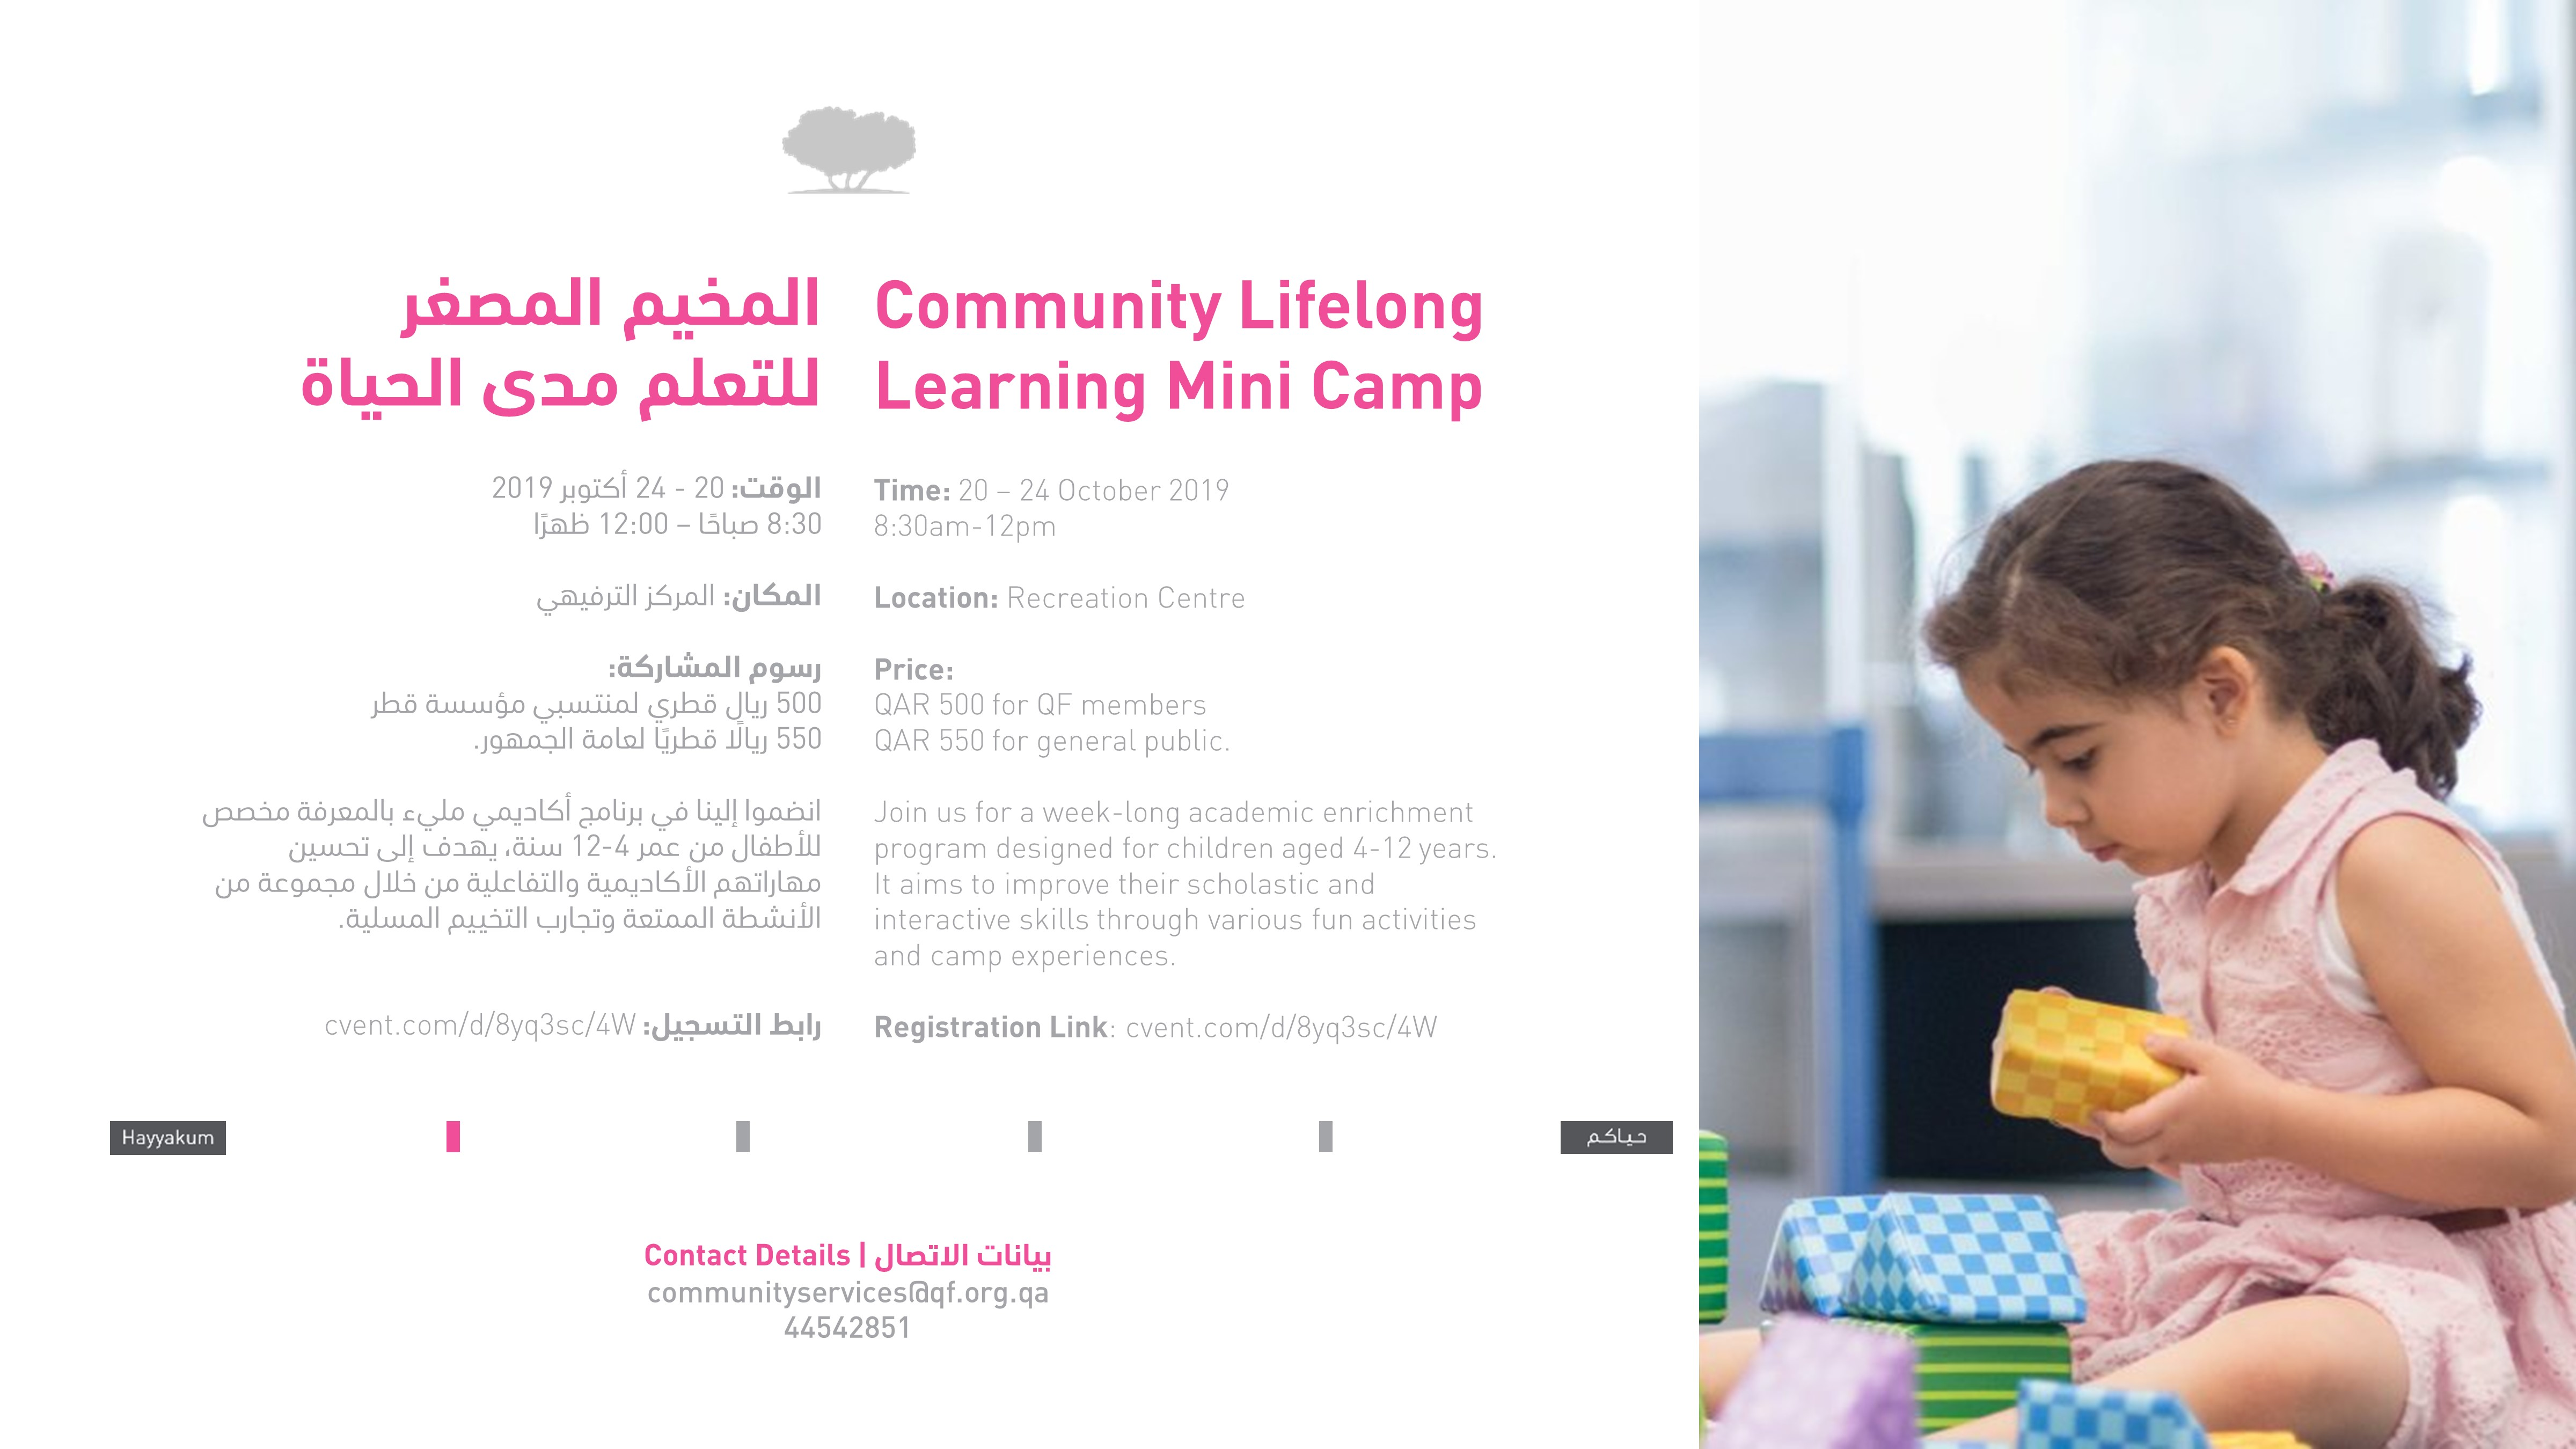 Life Long Learning Mini Camp